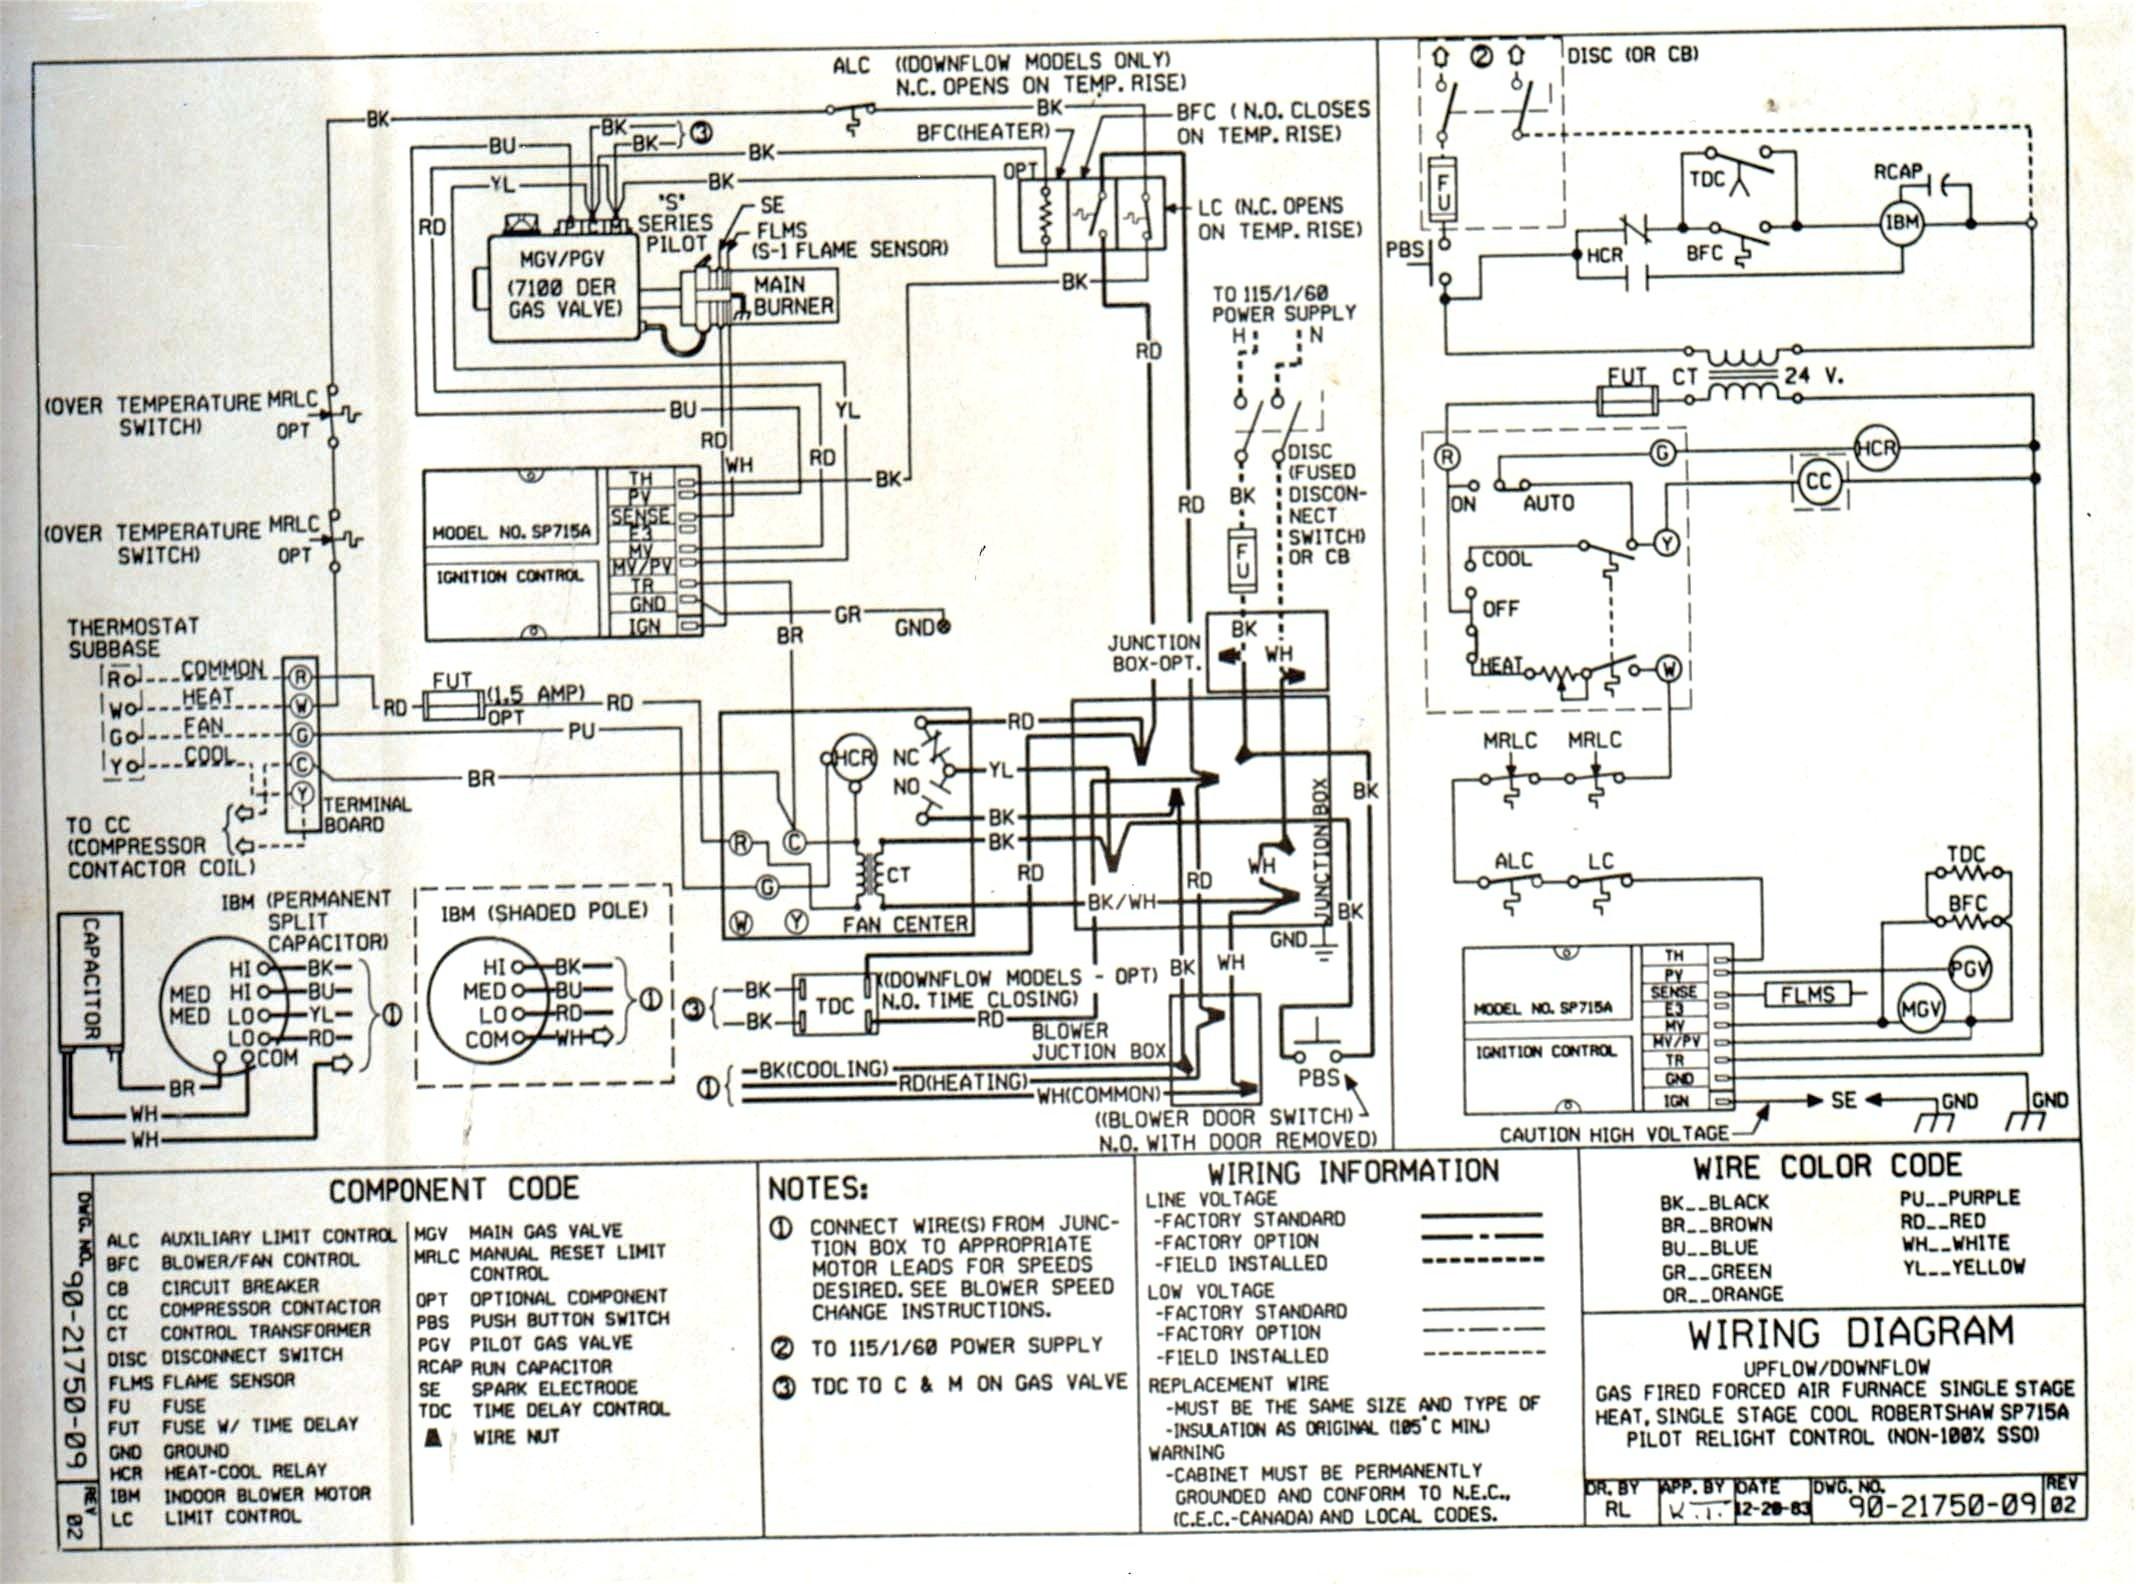 Car Air Conditioner Diagram New Wiring Diagram Car Ac Of Car Air Conditioner Diagram